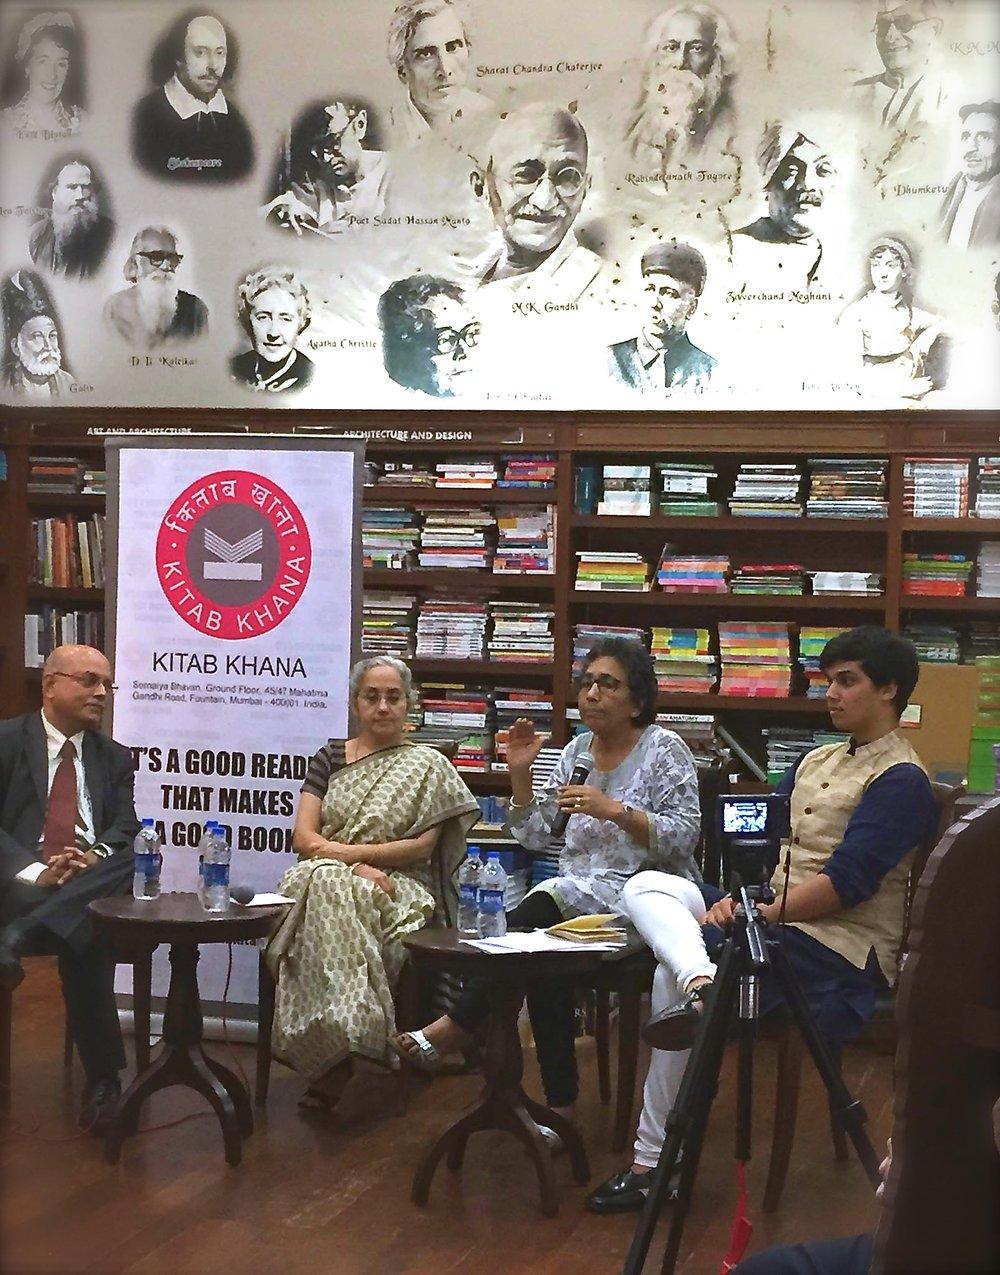 Panel Discussion at Kitab Khana, a bookstore, on The Indian Emergency, October 2015 with Kalpana Sharma, a veteran journalist,Rajni Bakshi, a writer, and Shailesh Haribhakti, a businessman.